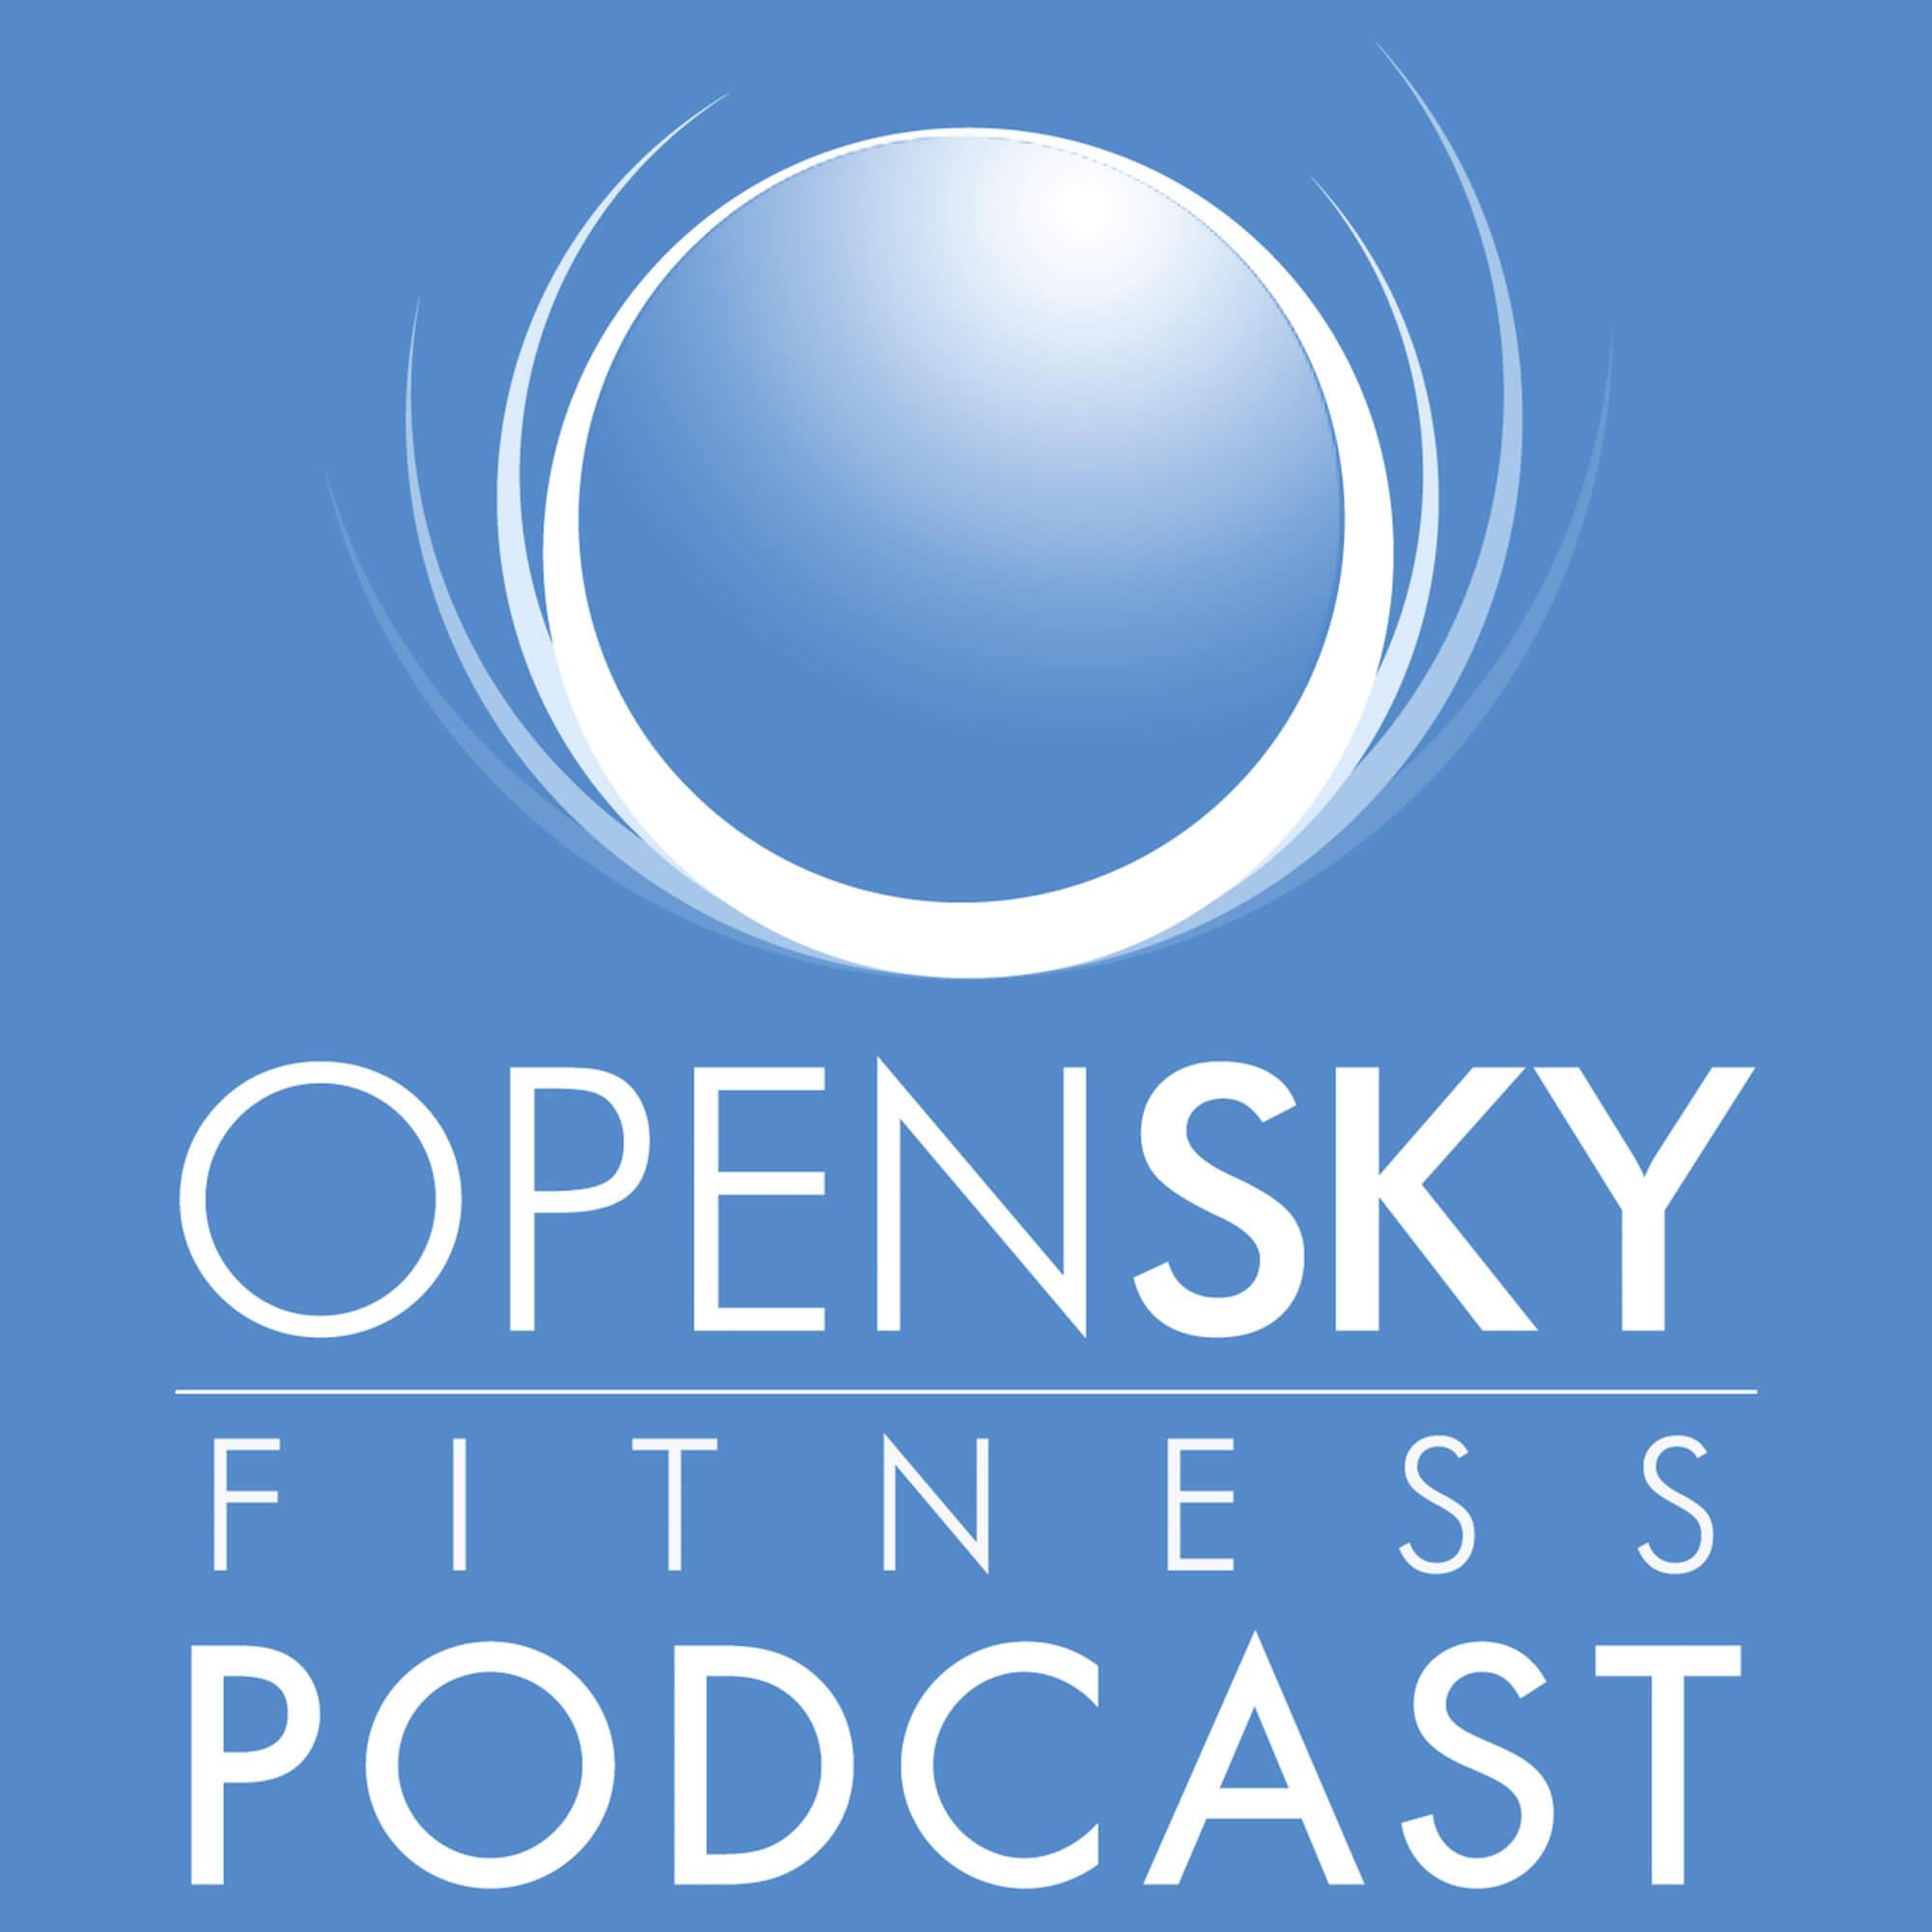 Open Sky Fitness Podcast show art